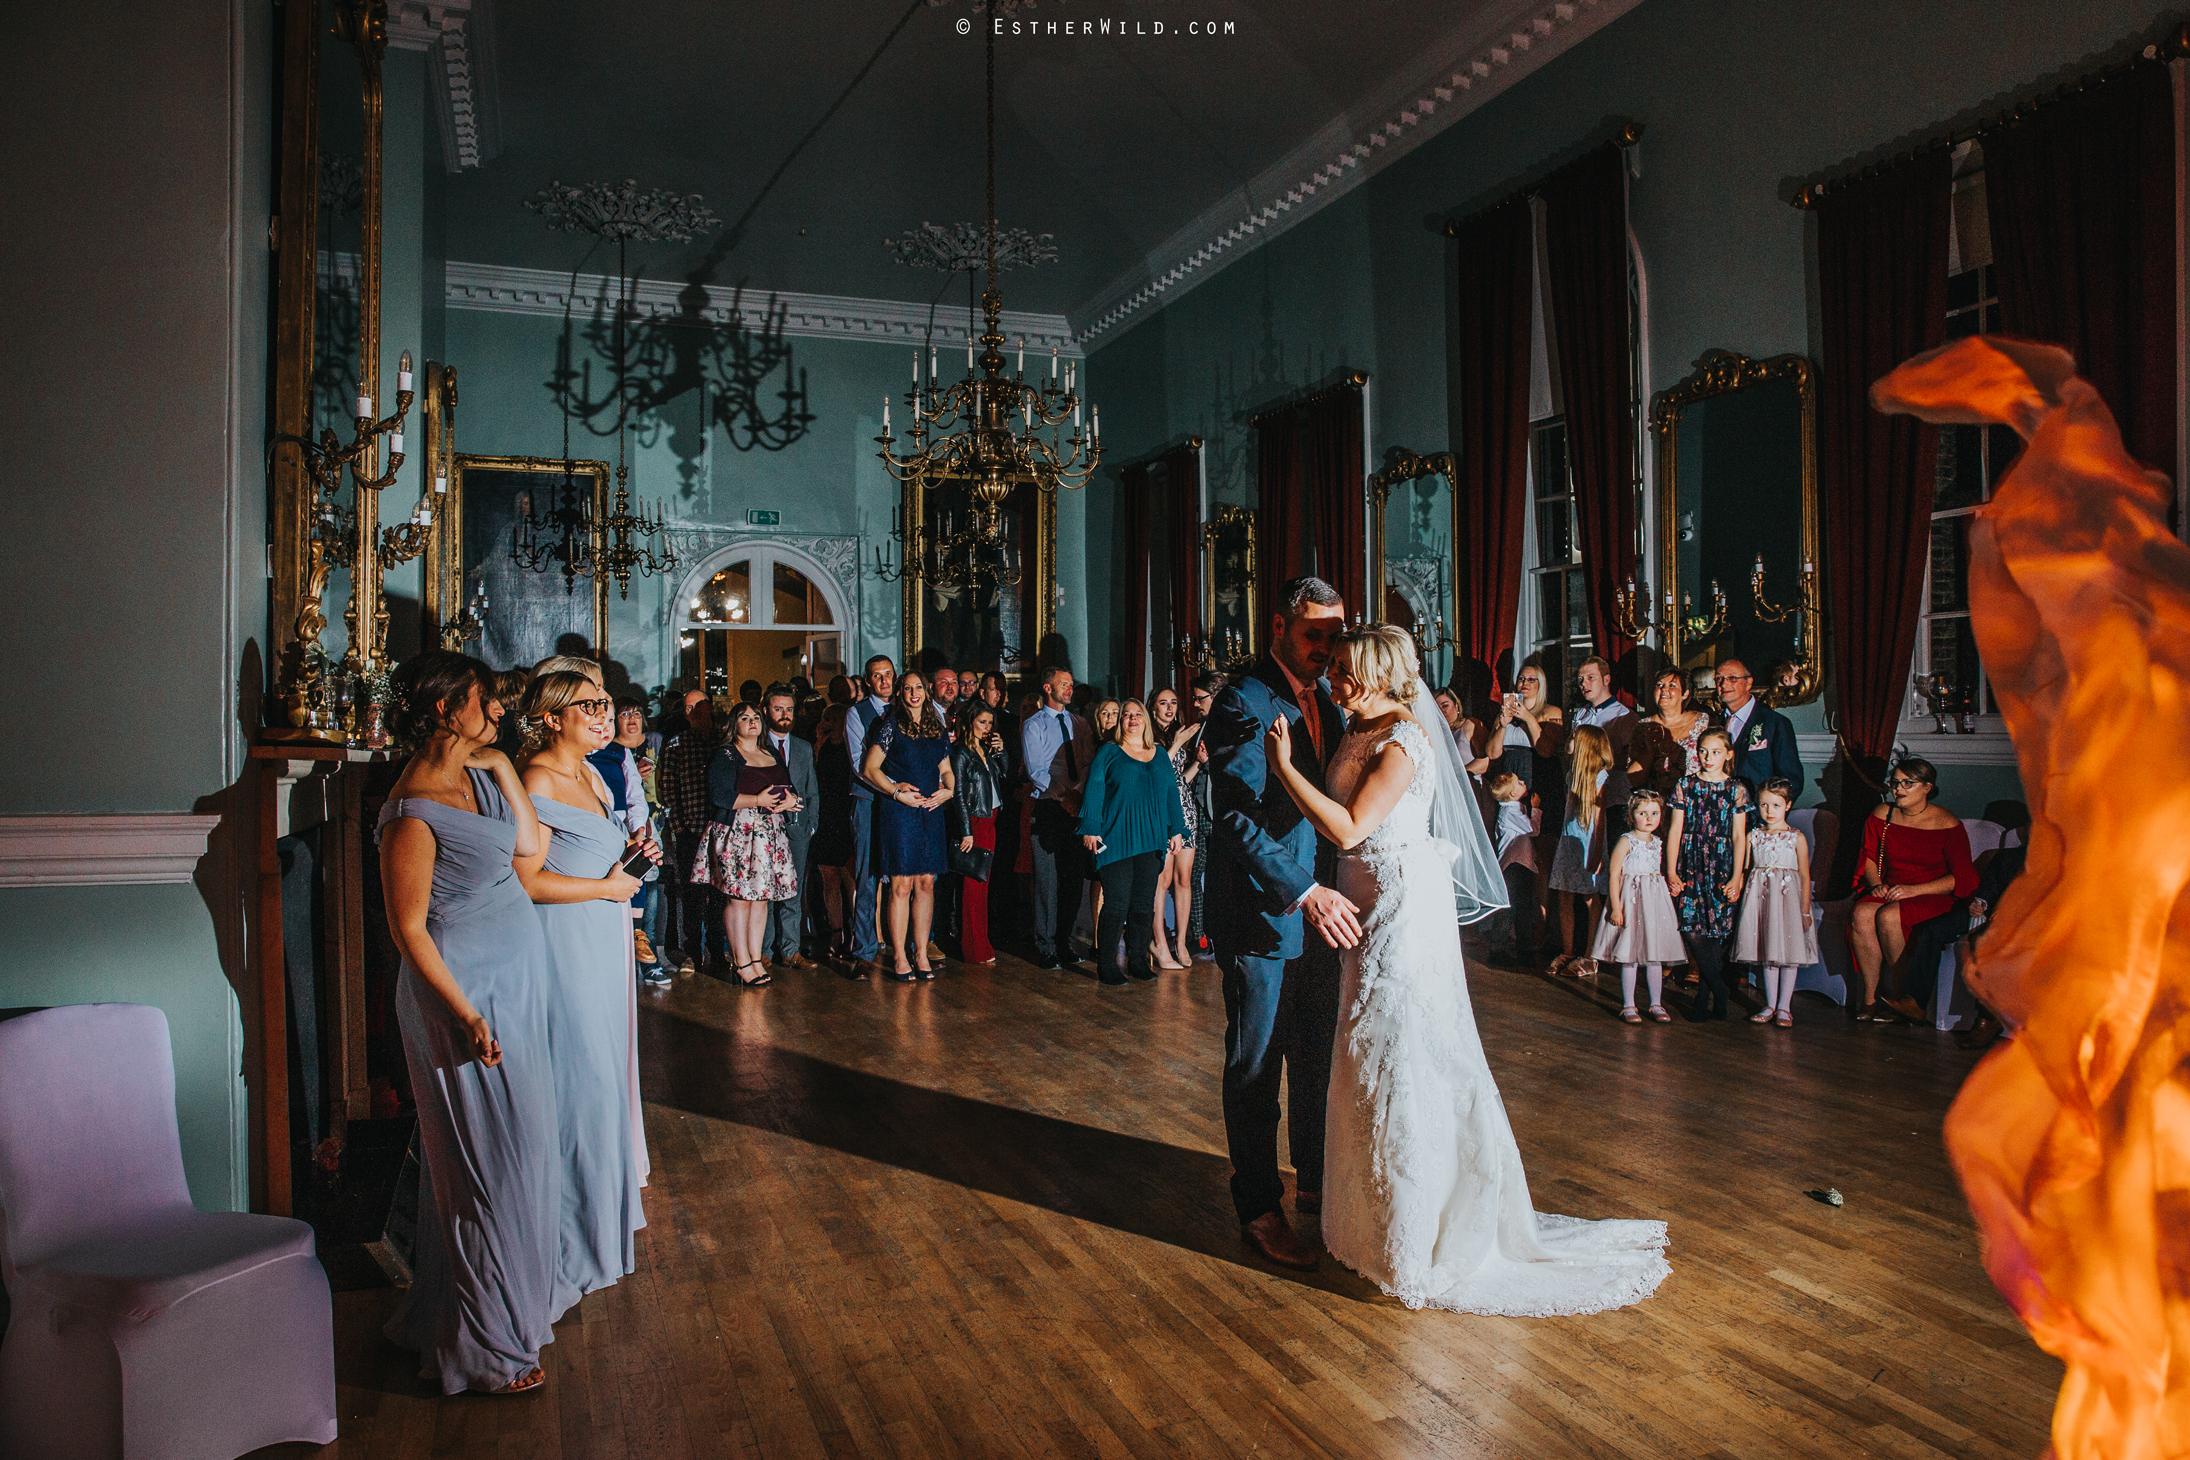 Wedding_Kings_Lynn_Town_Hall_Norfolk_Photographer_Esther_Wild_IMG_1825_IMGL0797.jpg